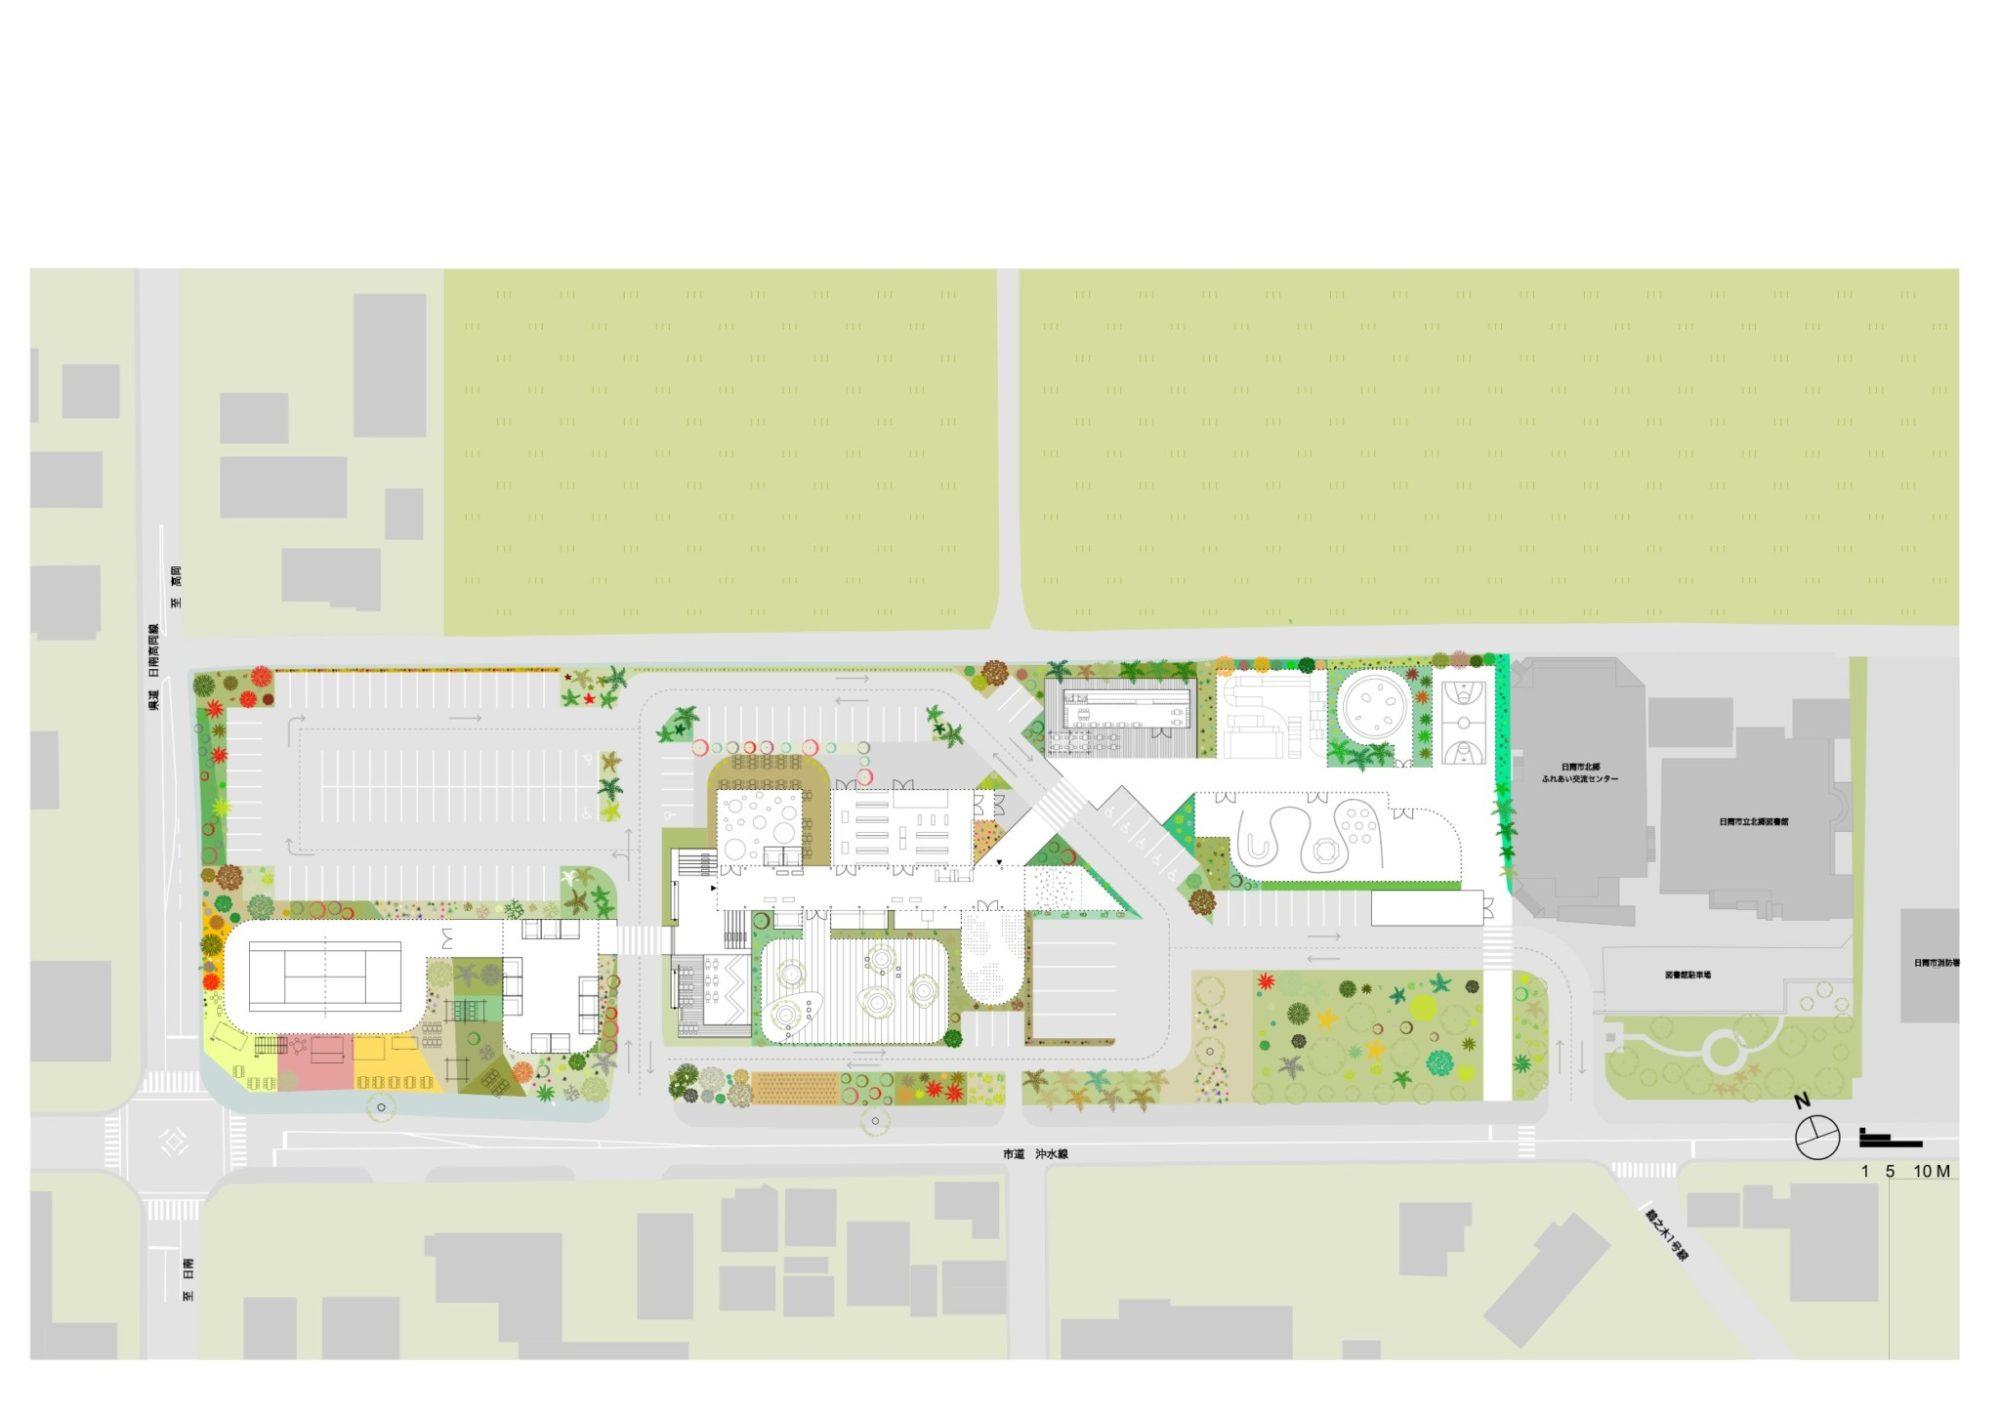 Kitago Michi no eki Proposal roadside station by mosaic design 北郷 道の駅 プロポーザル by モザイクデザイン Architect Ko Nakamura 中村航